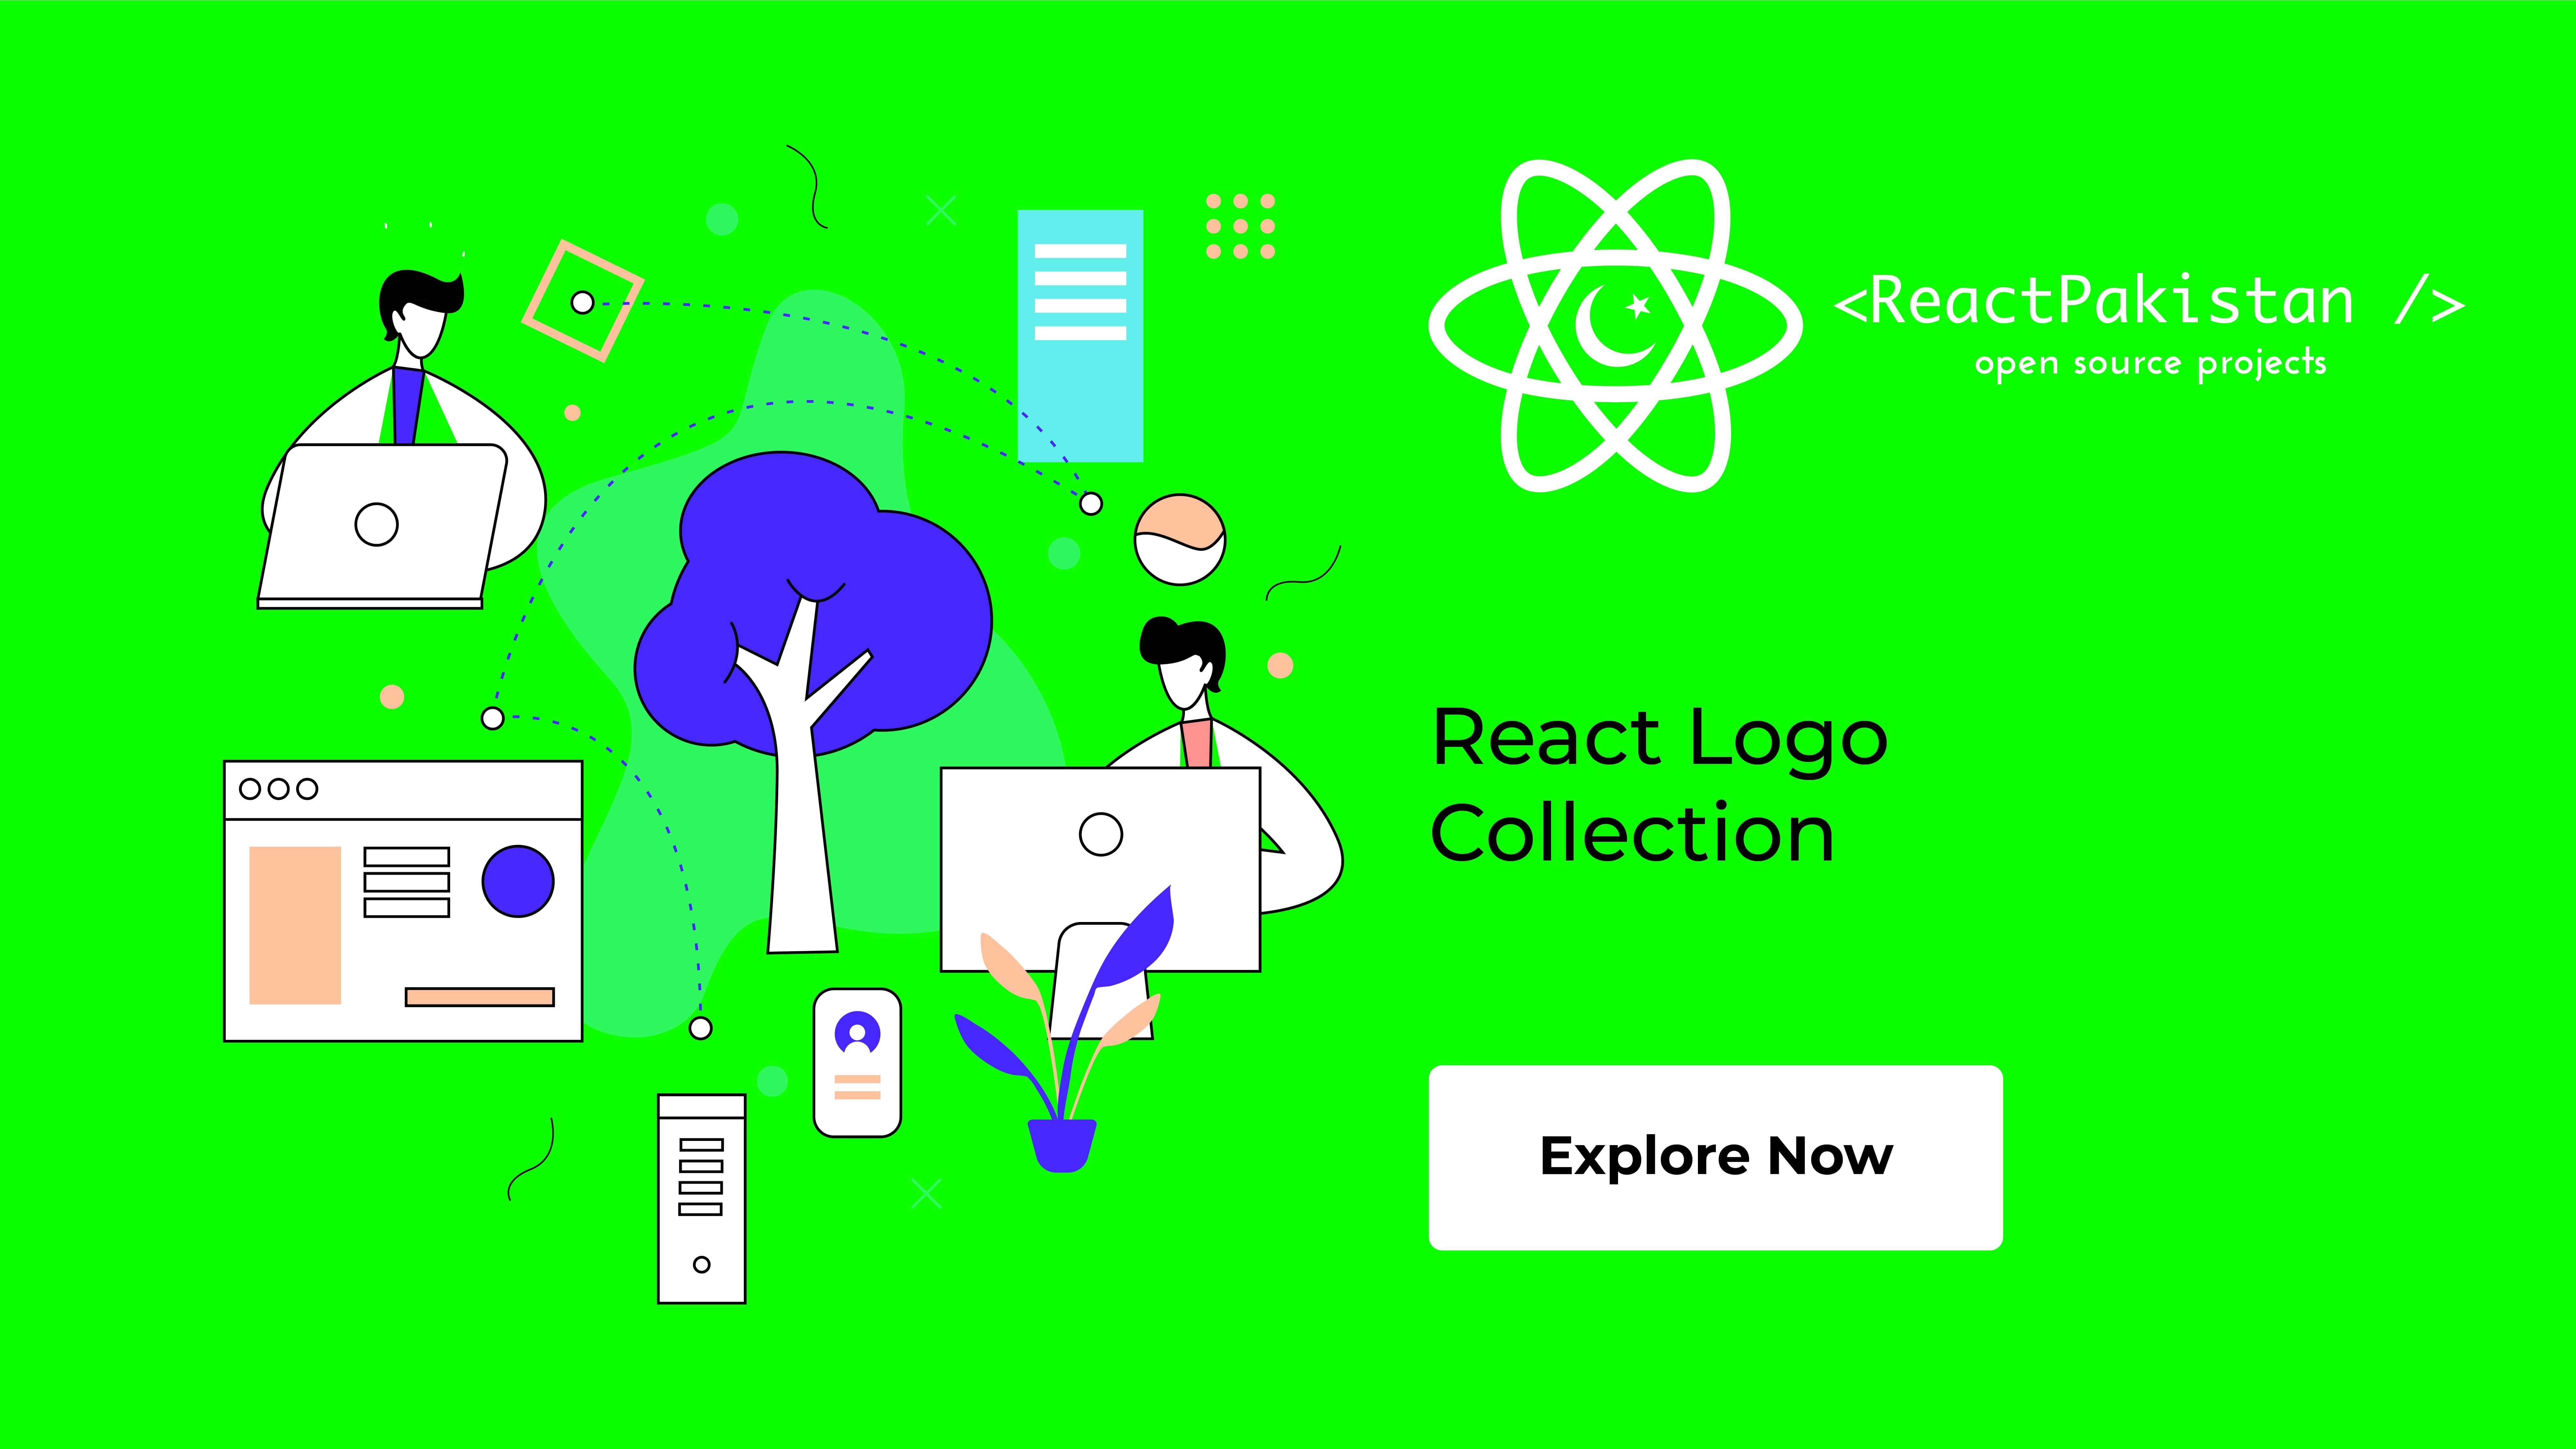 React Pakistan - React Logo Collection